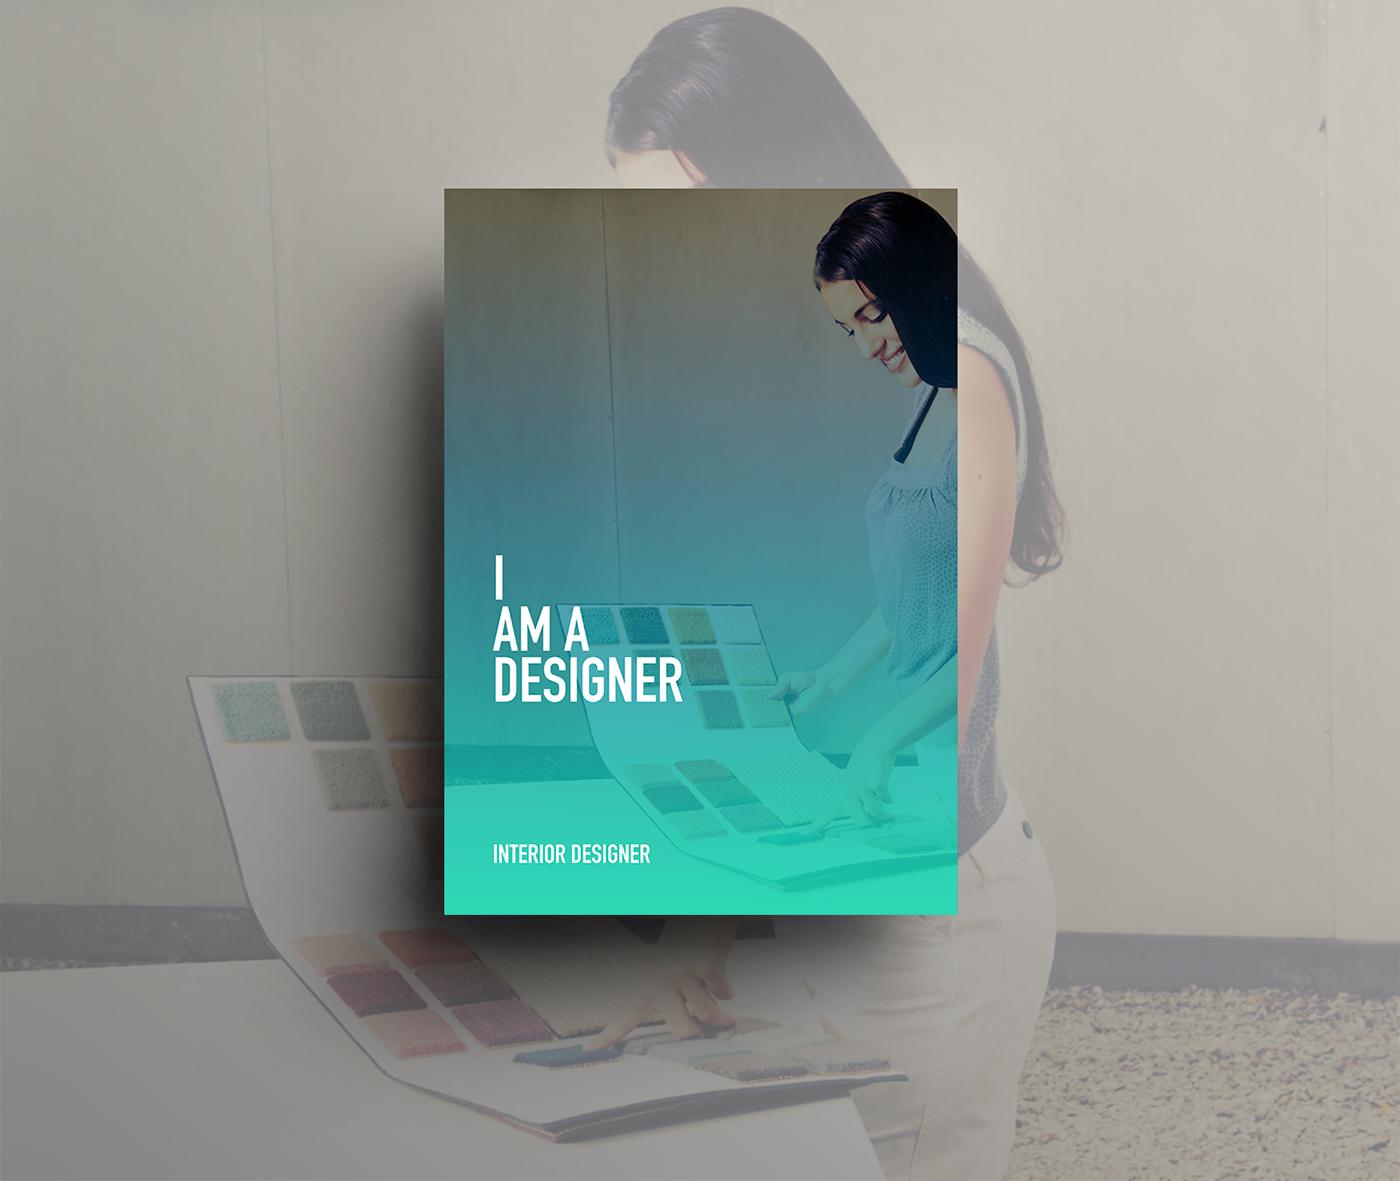 Adobe Portfolio,design,designer,product designer,Graphic Designer,interior designer,Web designer,sound designer,game designer,Fashion Designer,industrial designer,colors,poster,Poster series